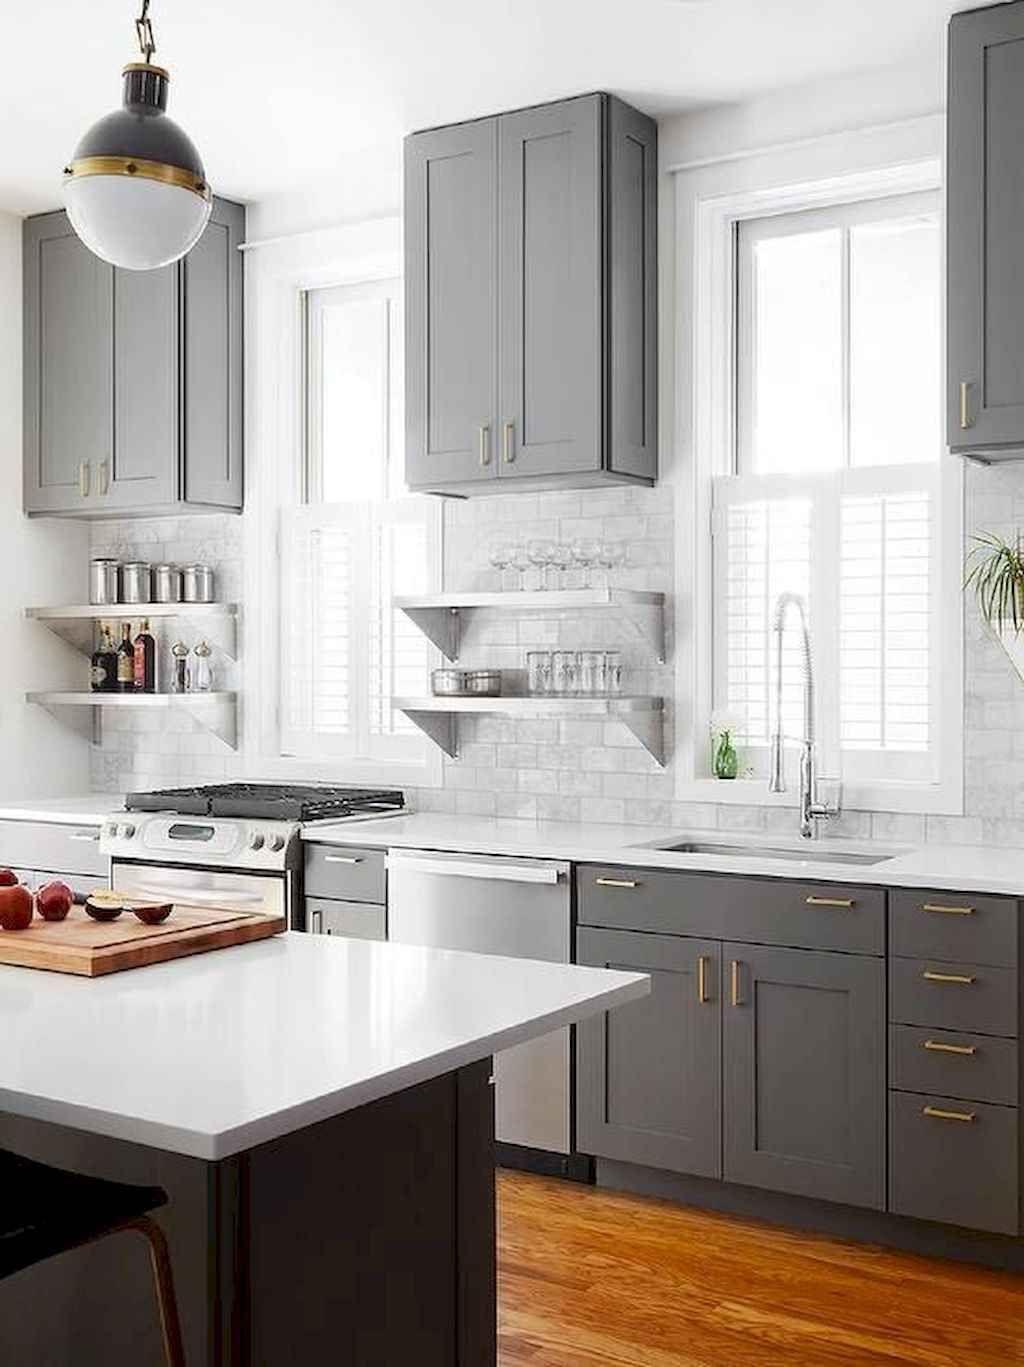 75 farmhouse gray kitchen cabinet design ideas kitchen cabinets decor kitchen renovation on farmhouse kitchen shelf decor id=22880